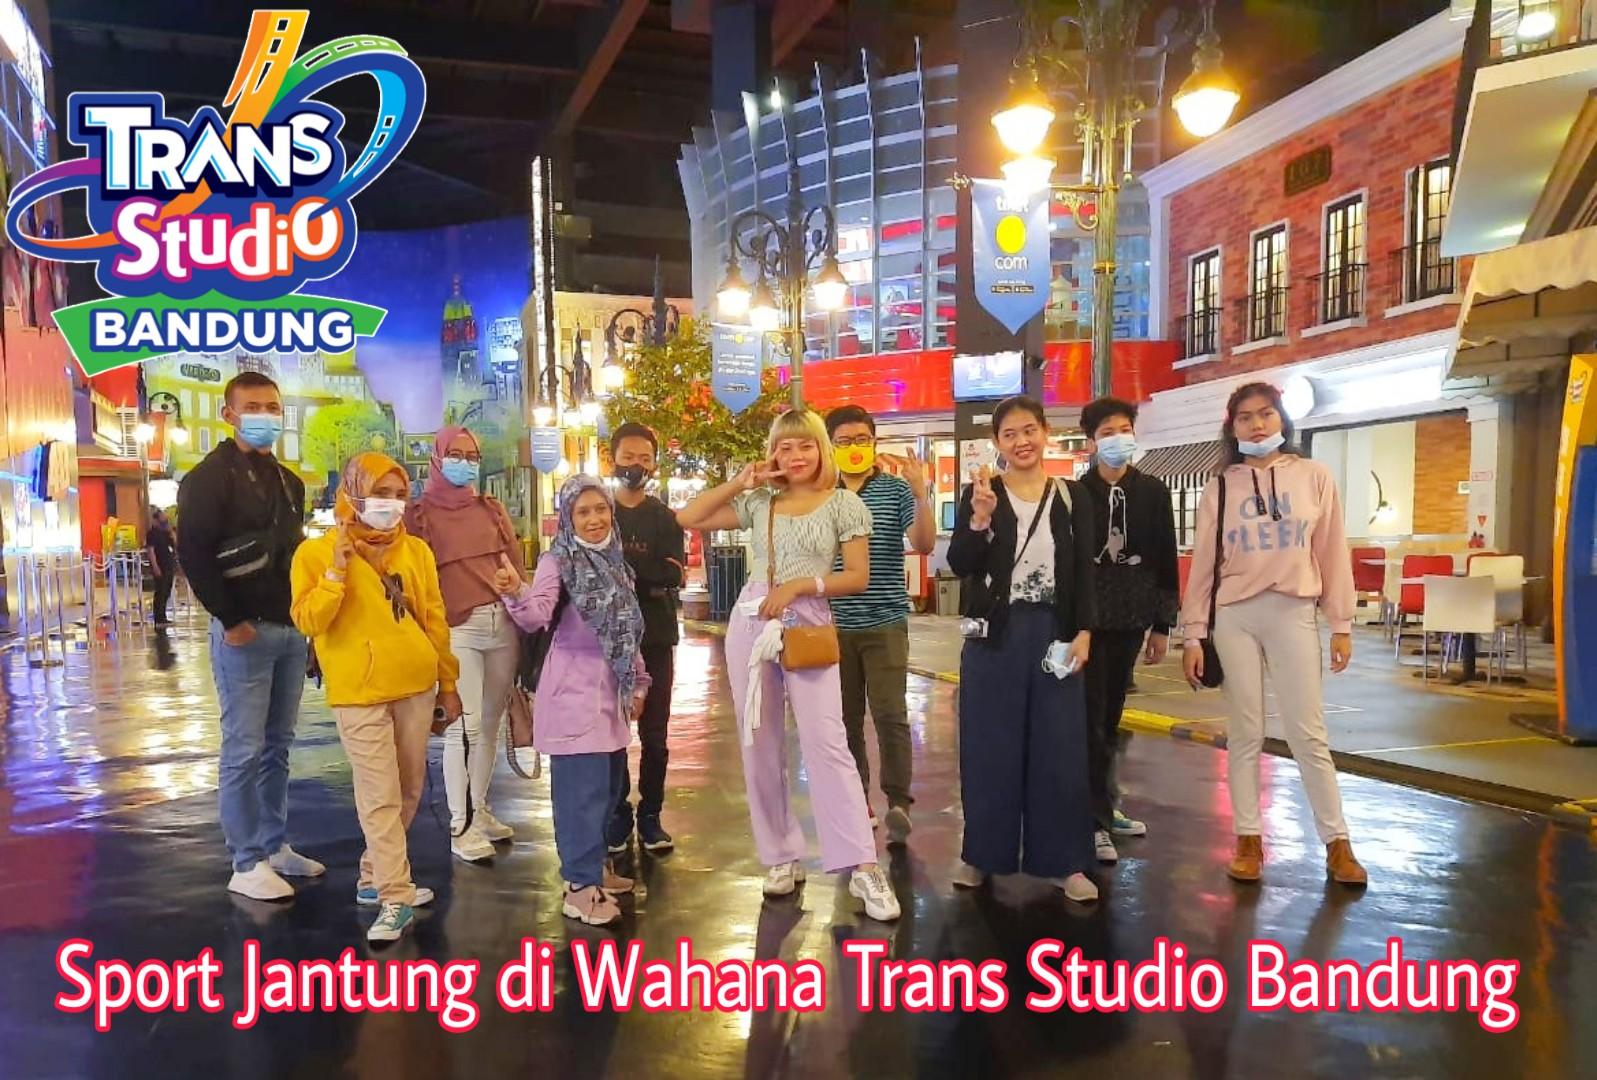 Sport Jantung di Wahana Trans Studio Bandung